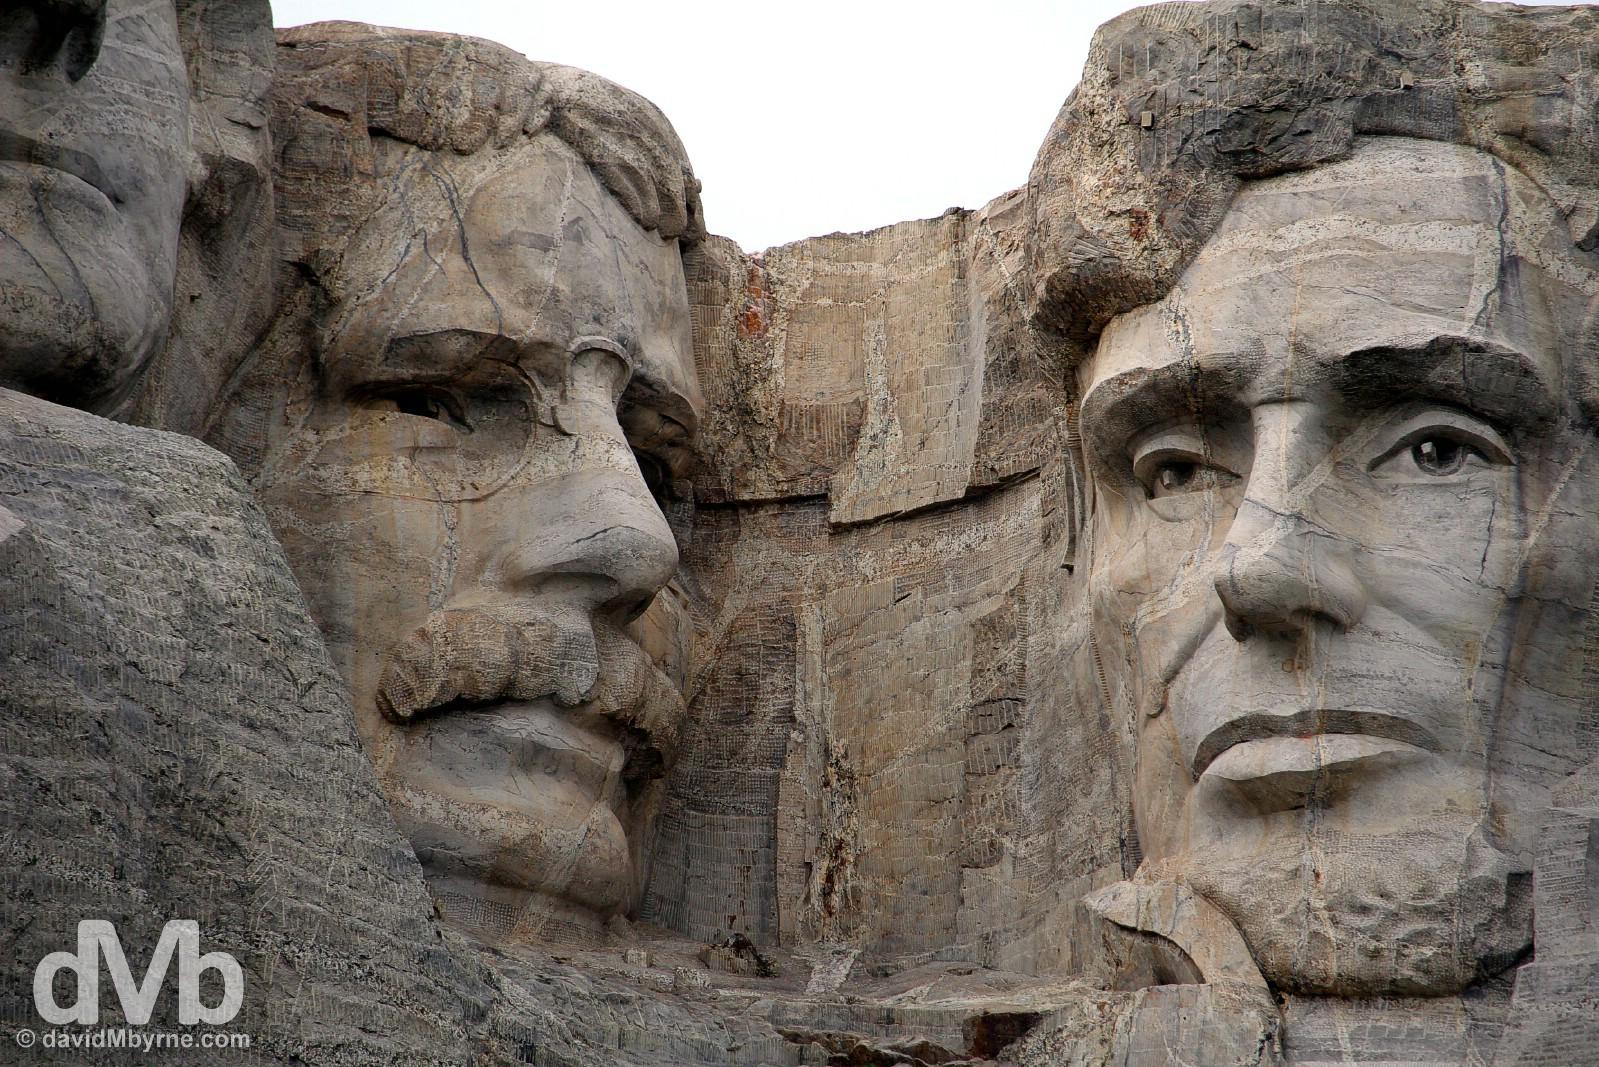 Mount Rushmore National Memorial, Black Hills, South Dakota, USA. September 2, 2016.